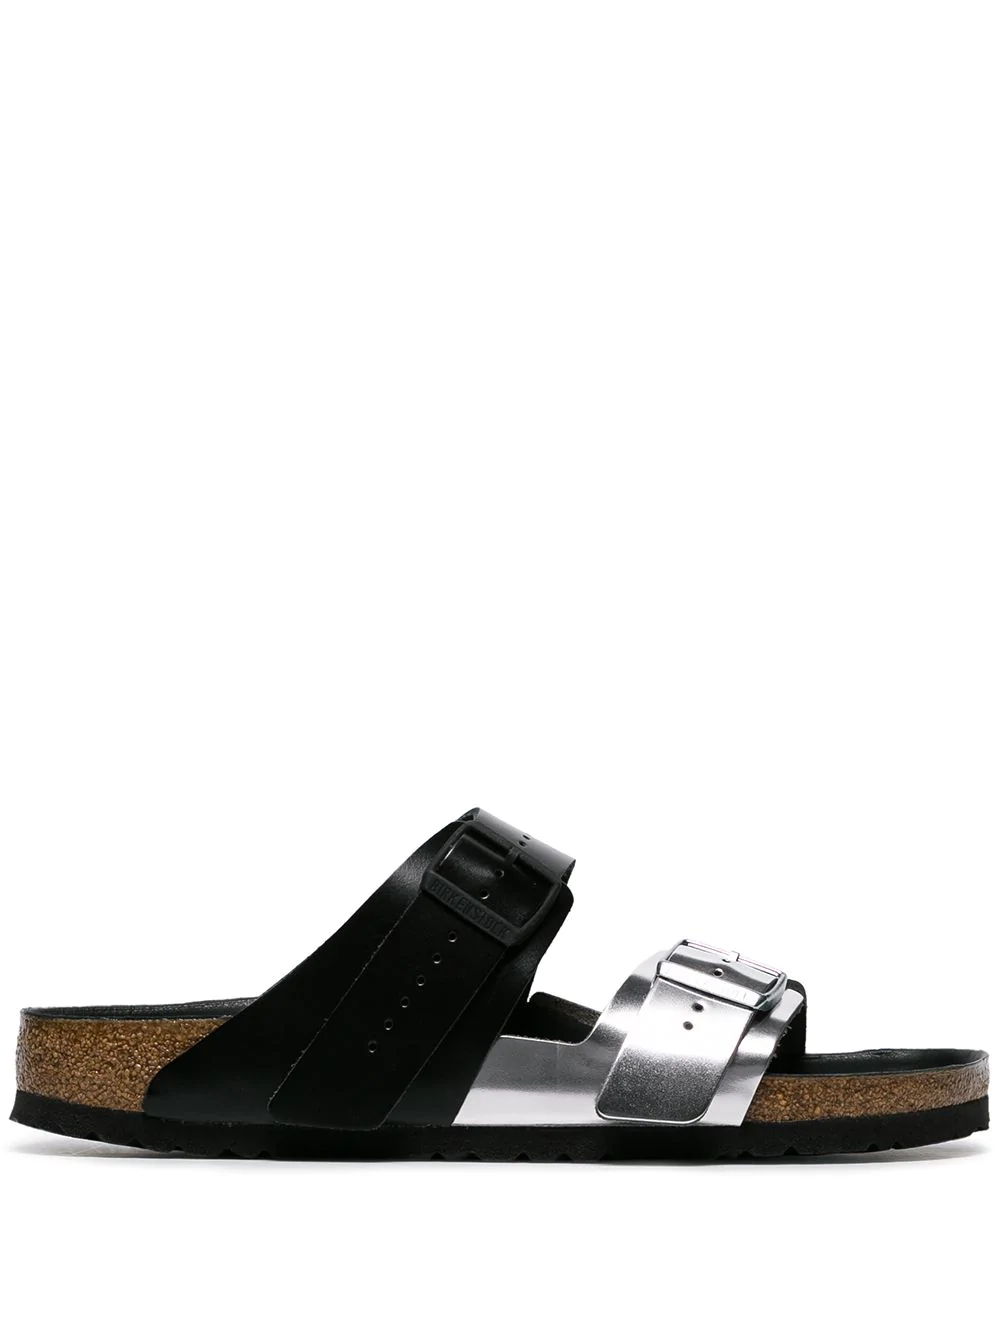 7db5216e90ce Rick Owens + Birkenstock Arizona Two-Tone Leather Sandals - Silver In Black